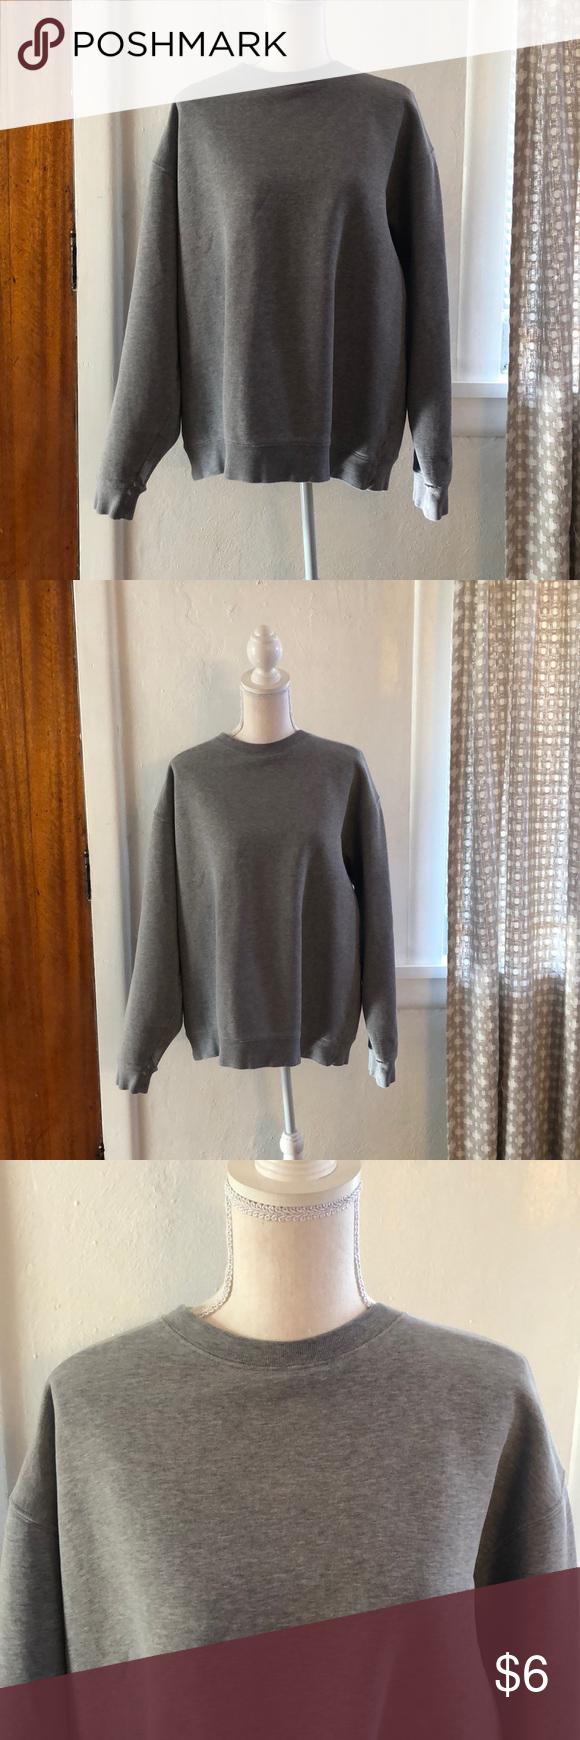 Vintage Lands End Gray Crew Sweatshirt Clothes Design Crew Sweatshirts Vintage Sweatshirt [ 1740 x 580 Pixel ]